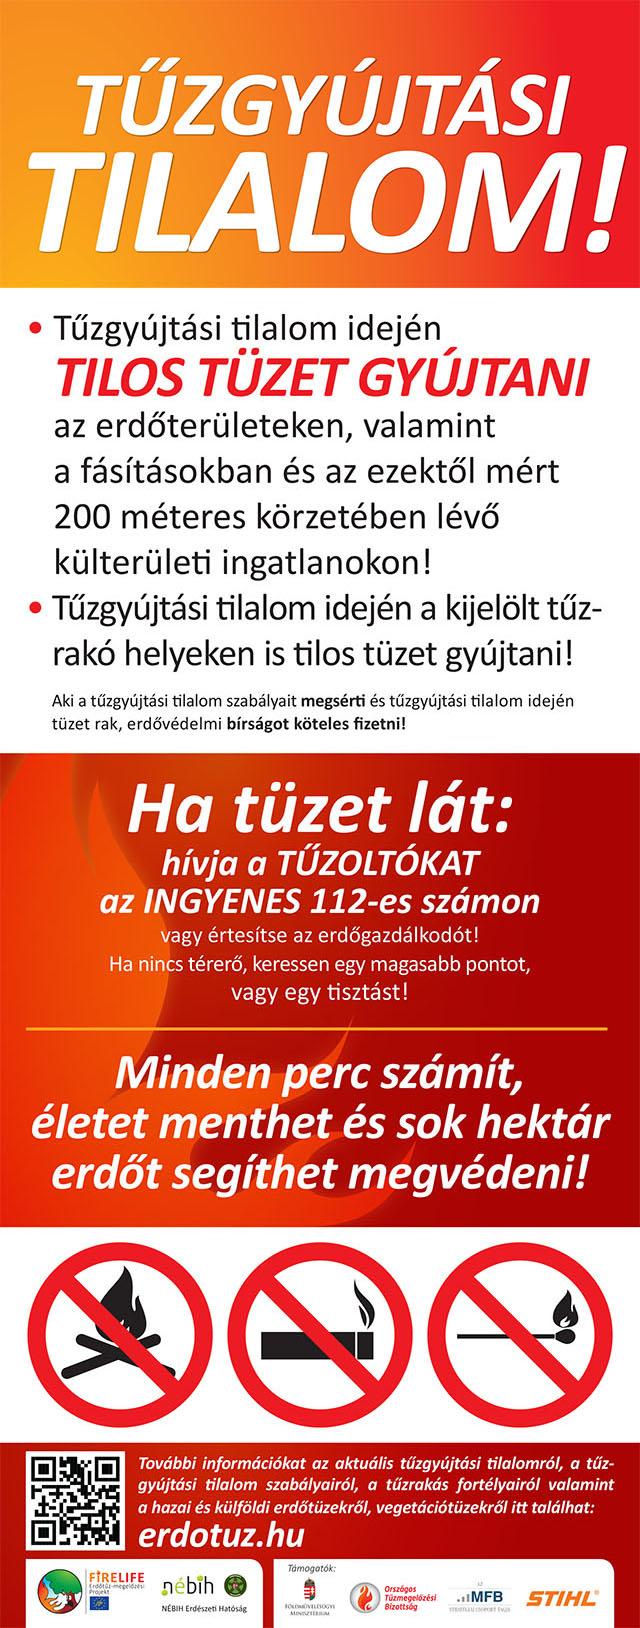 firelife_tabla_tuzgyujtasi_tilalom_148x420mm_w640.jpg